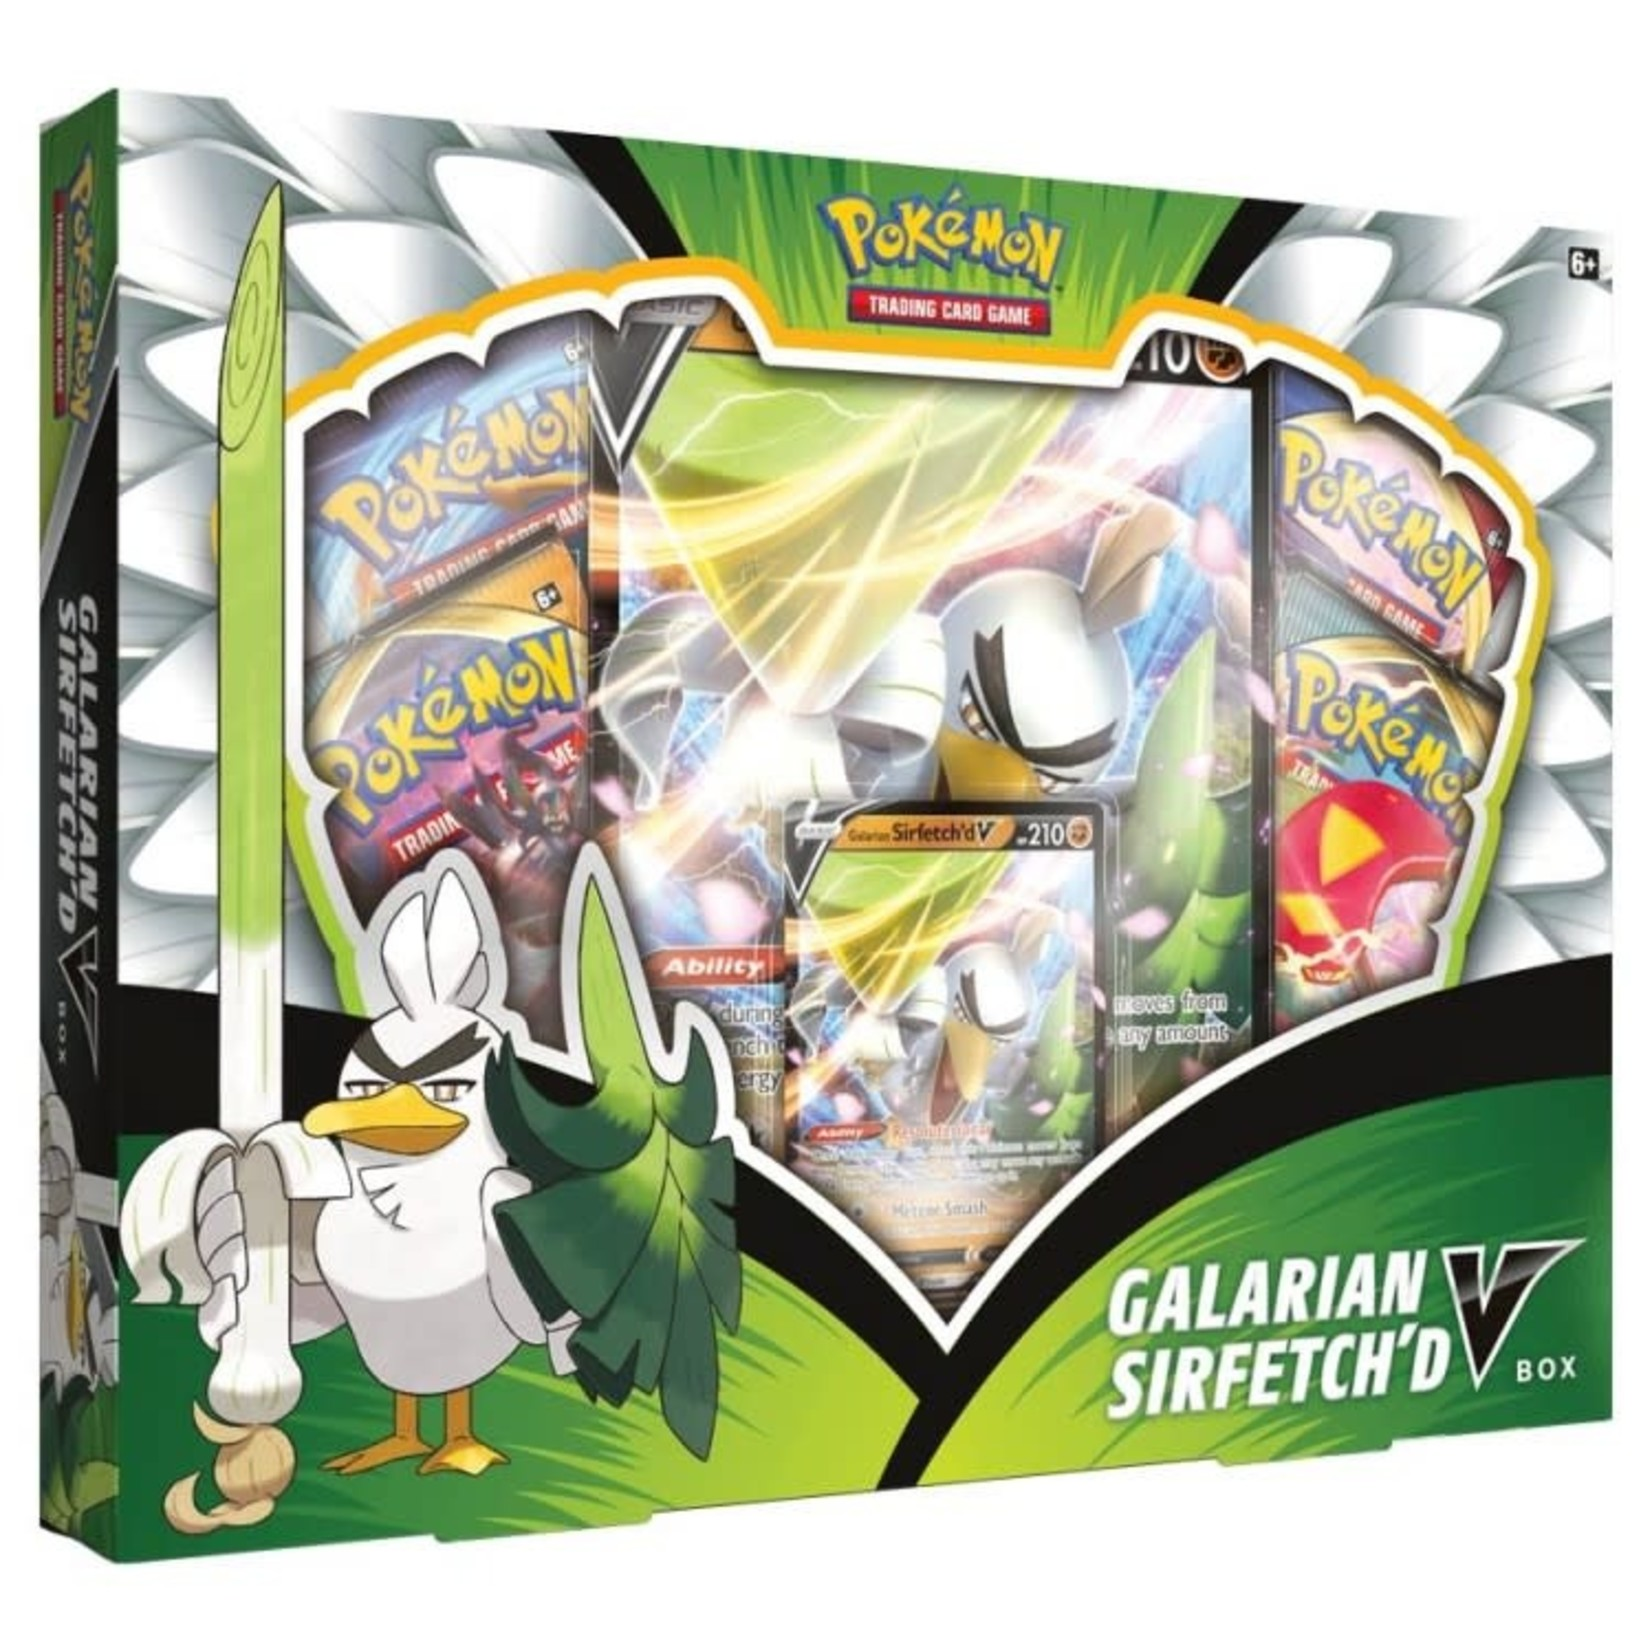 Pokemon International Pokémon TCG: Galarian Sirfetch'd V Box